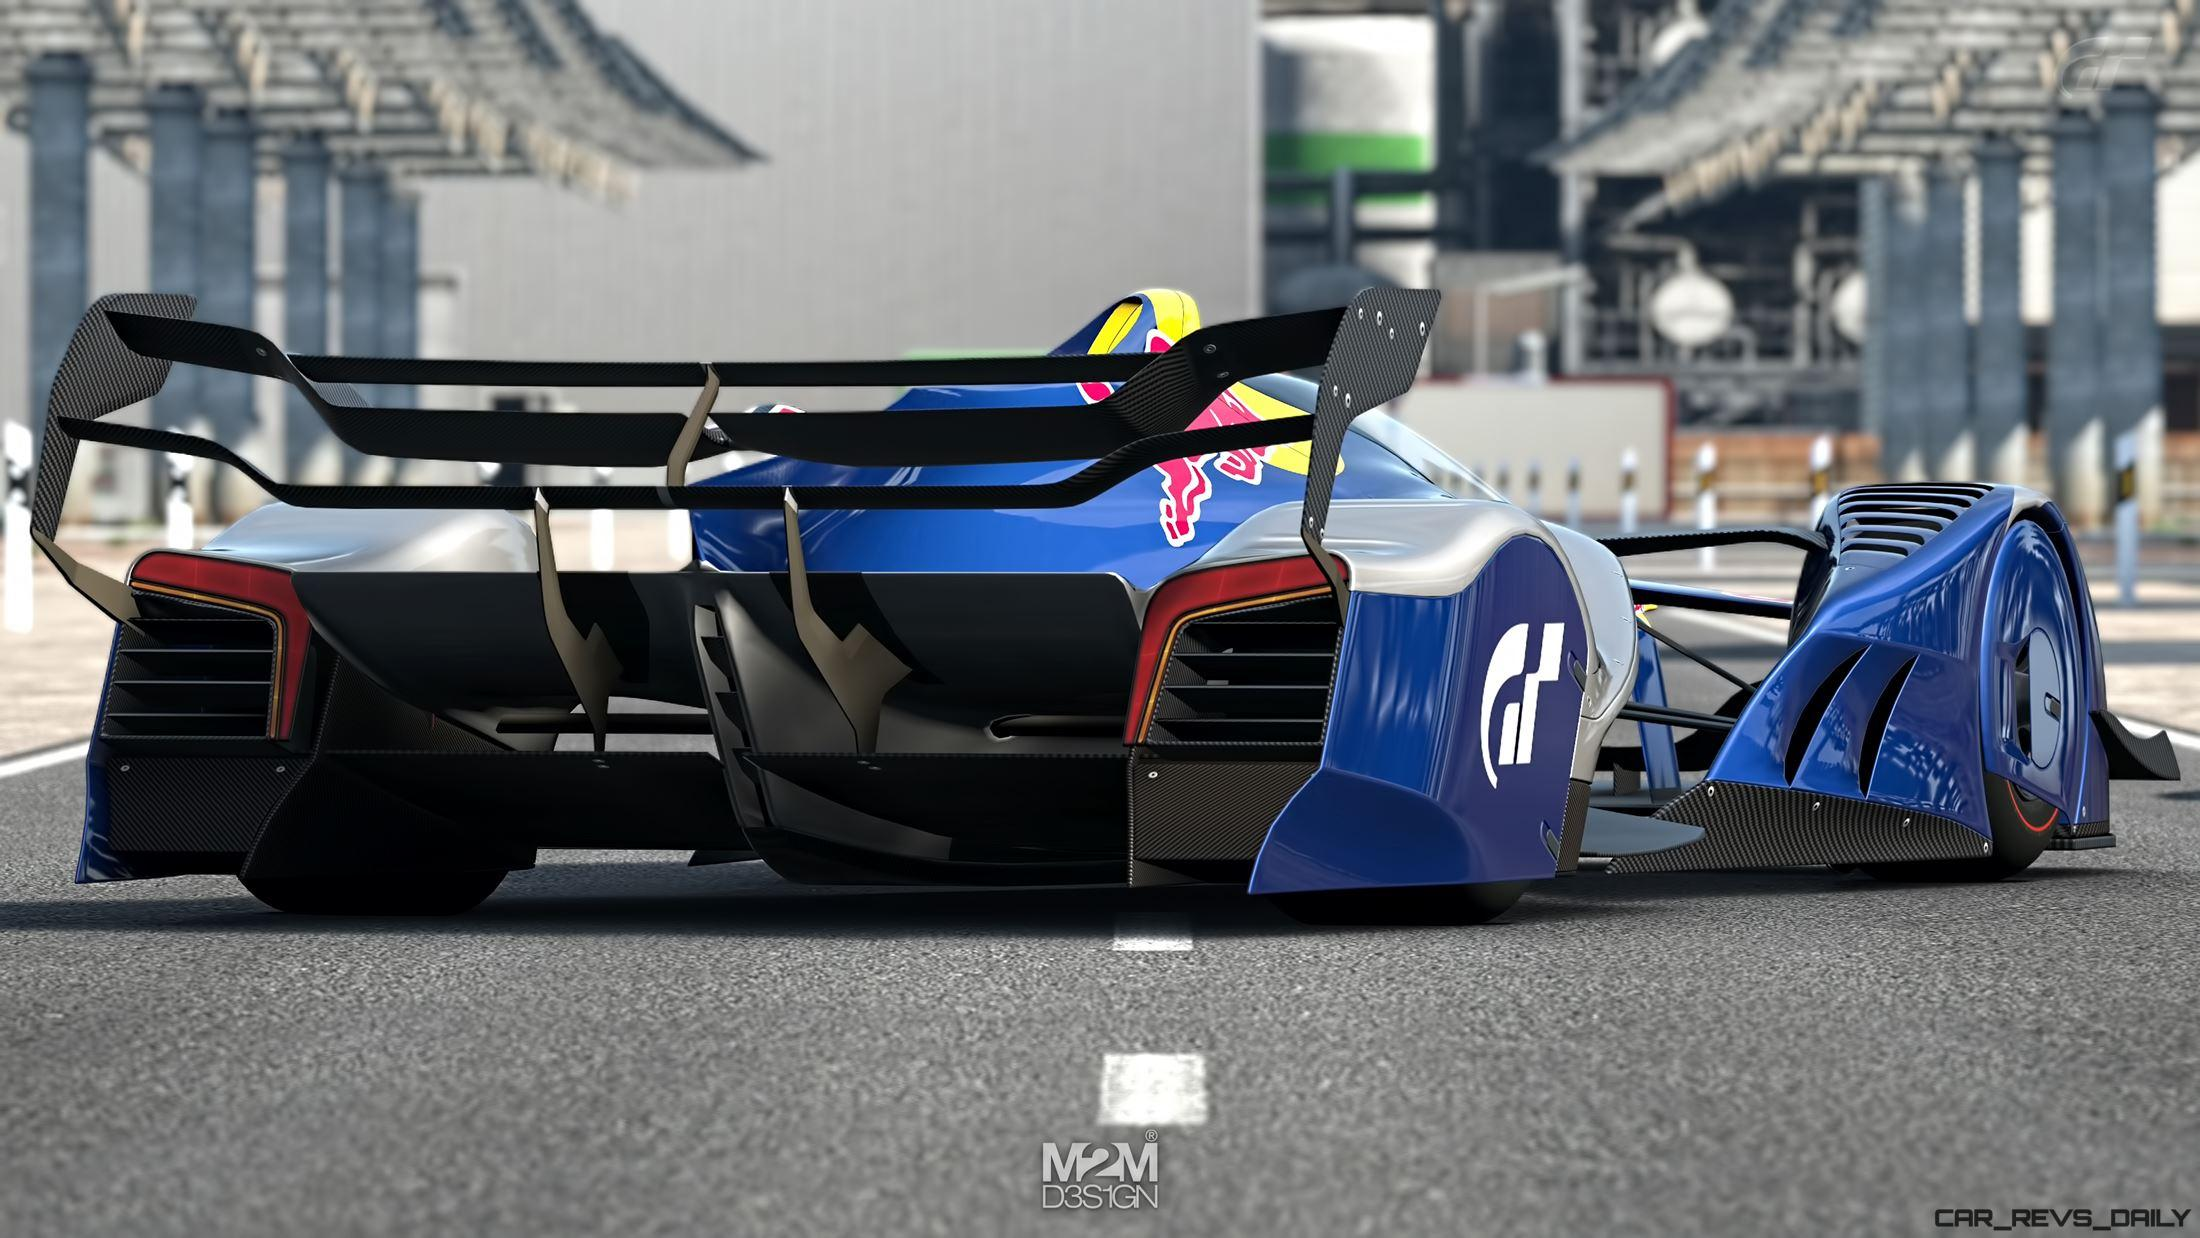 gran turismo red bull x2014 fan car genius racer now in 4d desktop size car shopping. Black Bedroom Furniture Sets. Home Design Ideas